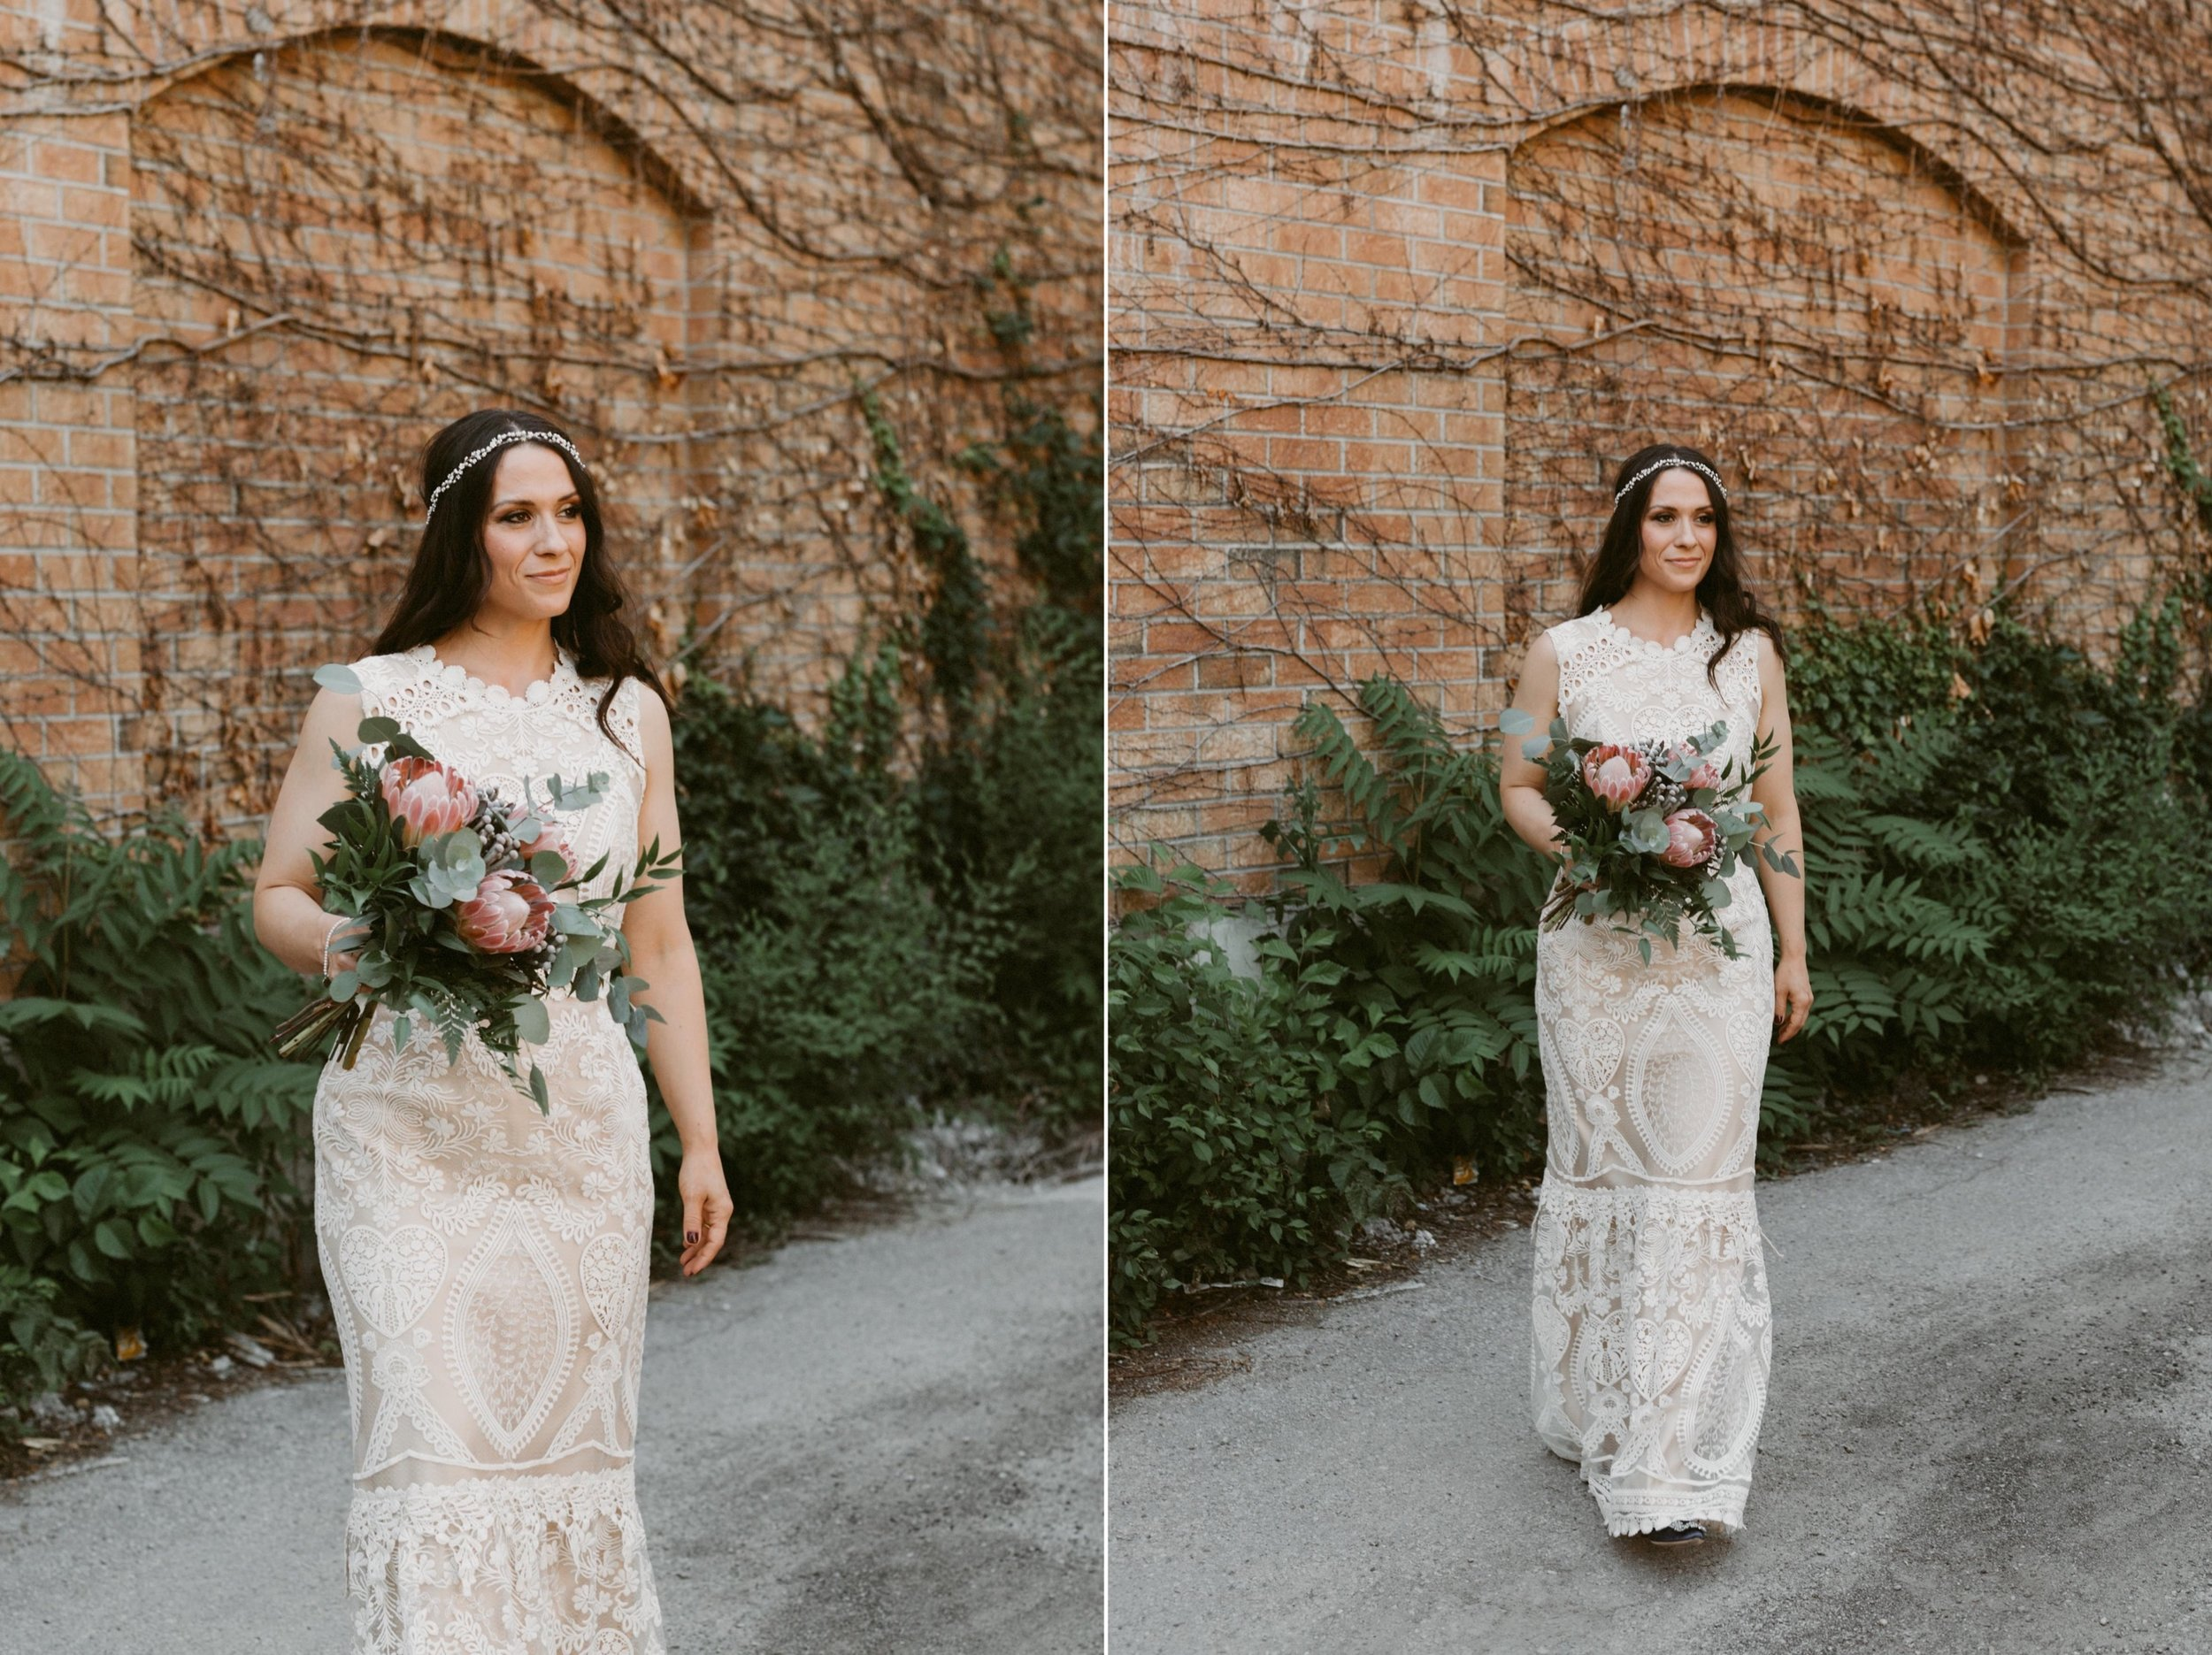 020_Spadina House Wedding (105 of 748)_Spadina House Wedding (104 of 748)_House_Spadina_Wedding_Toronto_intimate.jpg